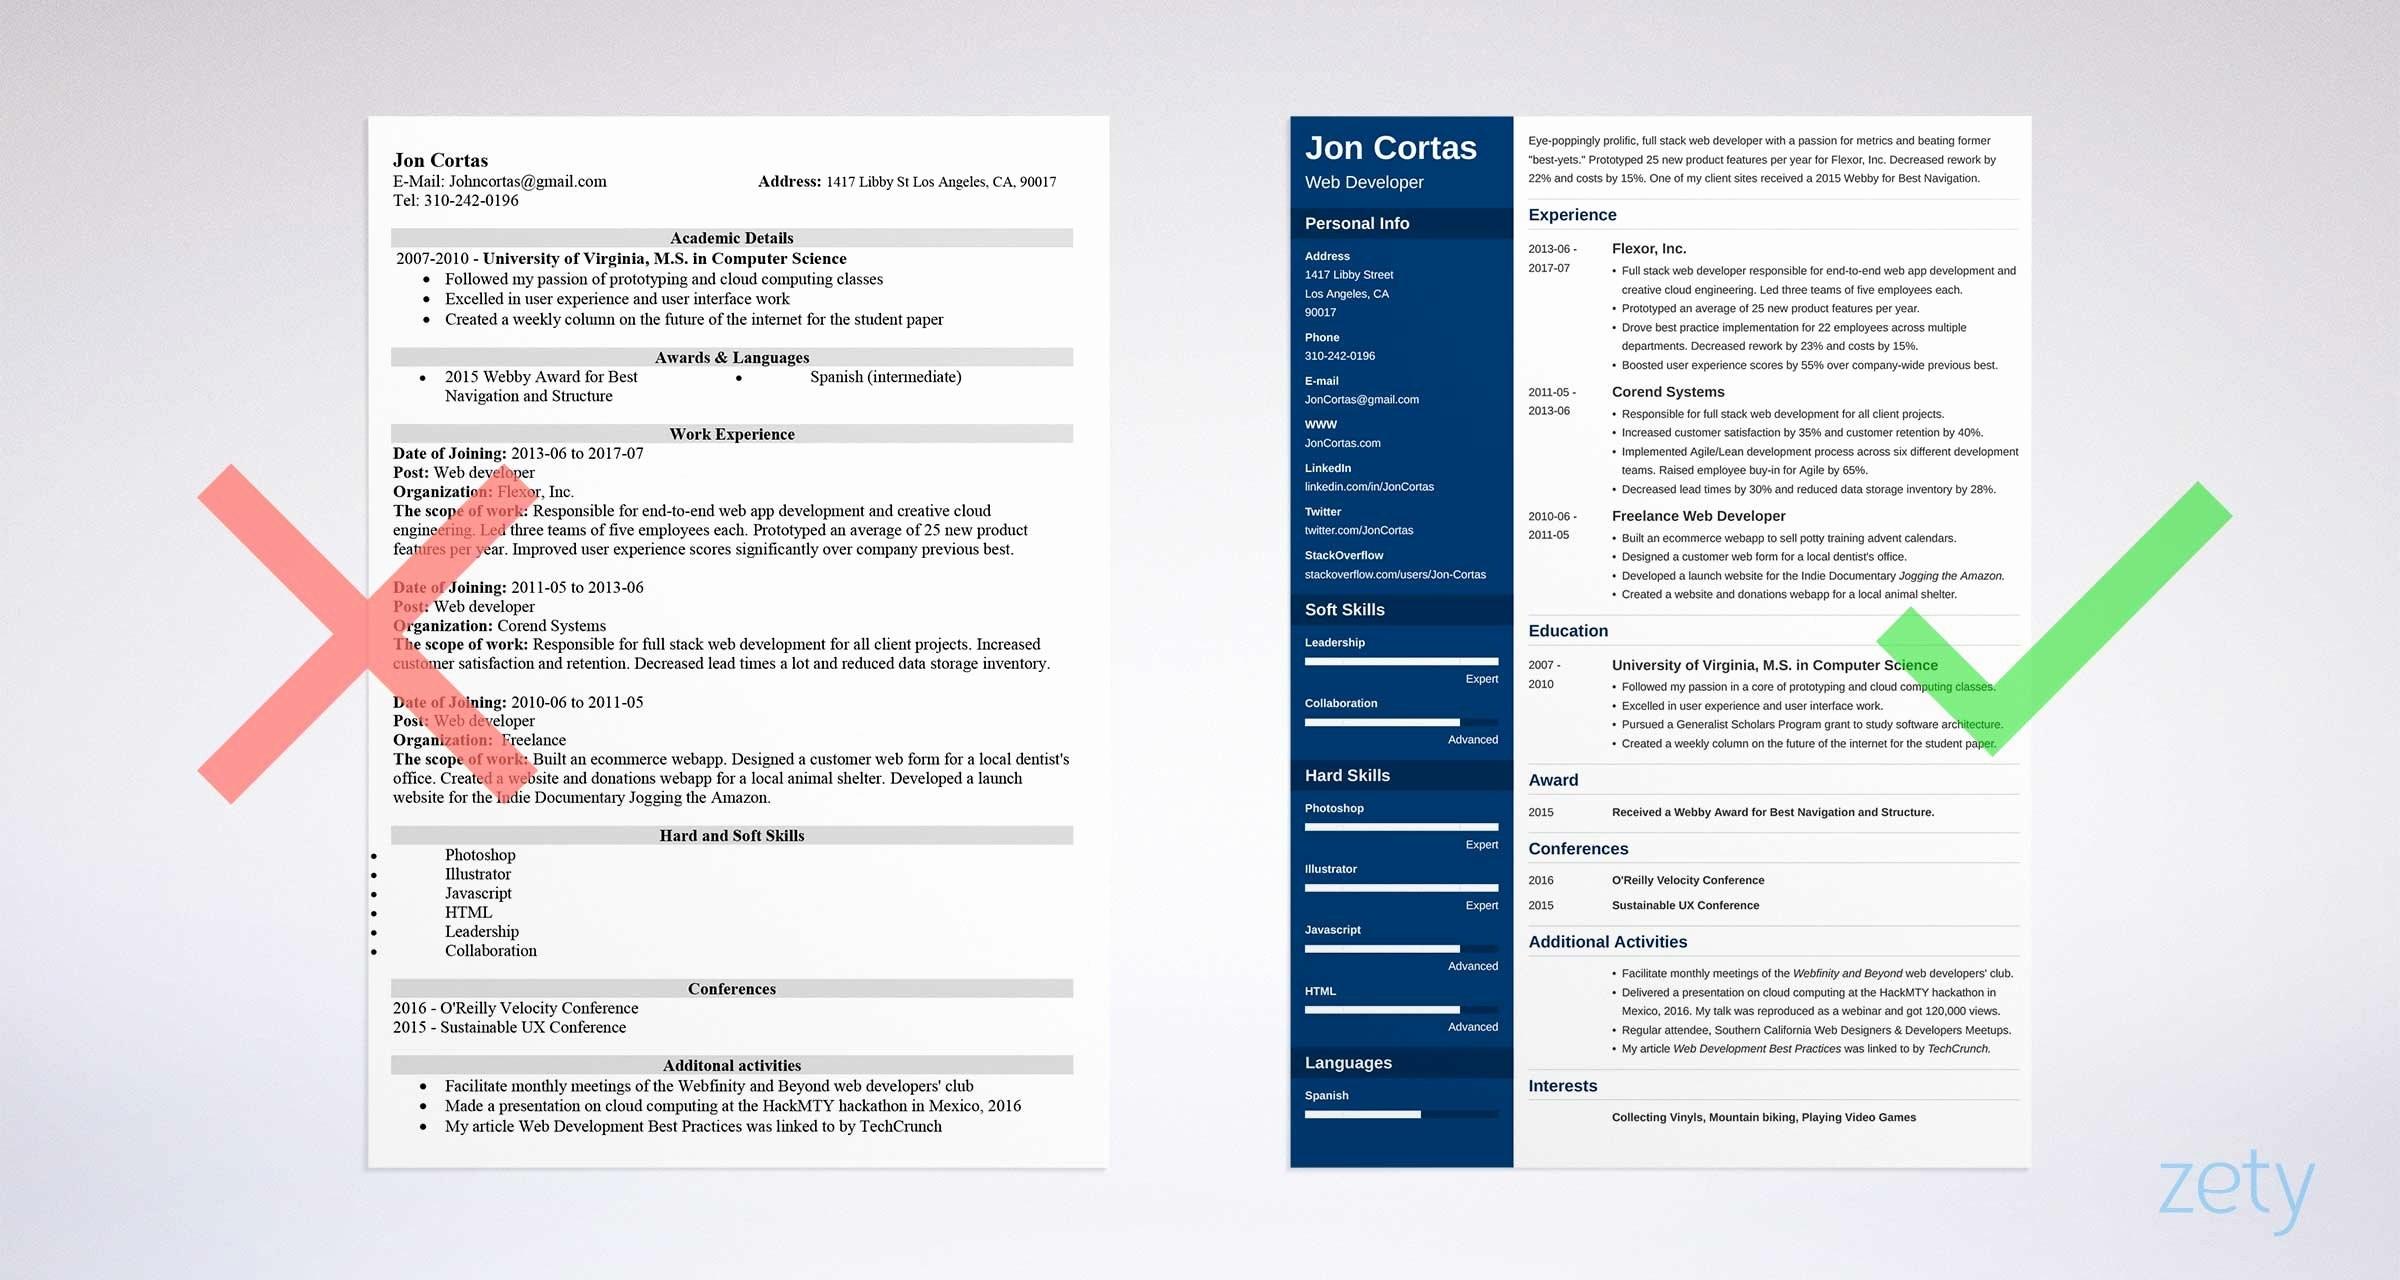 Resume Templates for Word Free Elegant Free Resume Templates for Word 15 Cv Resume formats to